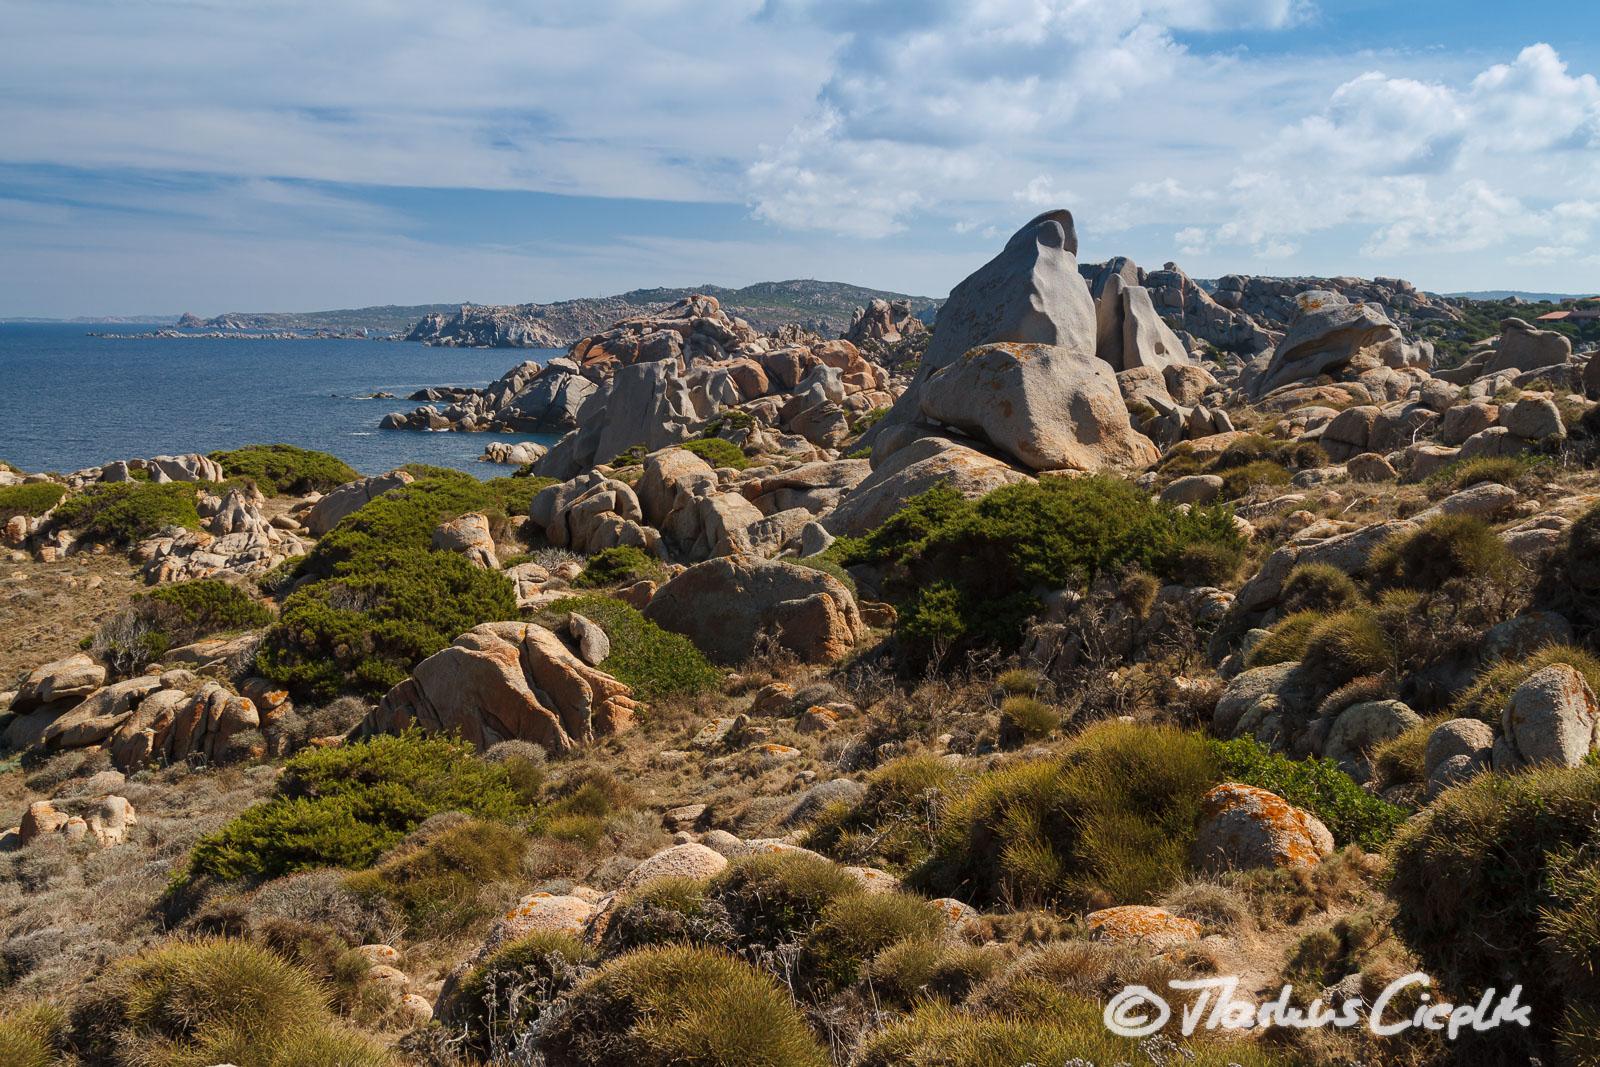 20110922_122440_Sardinien_1419.jpg